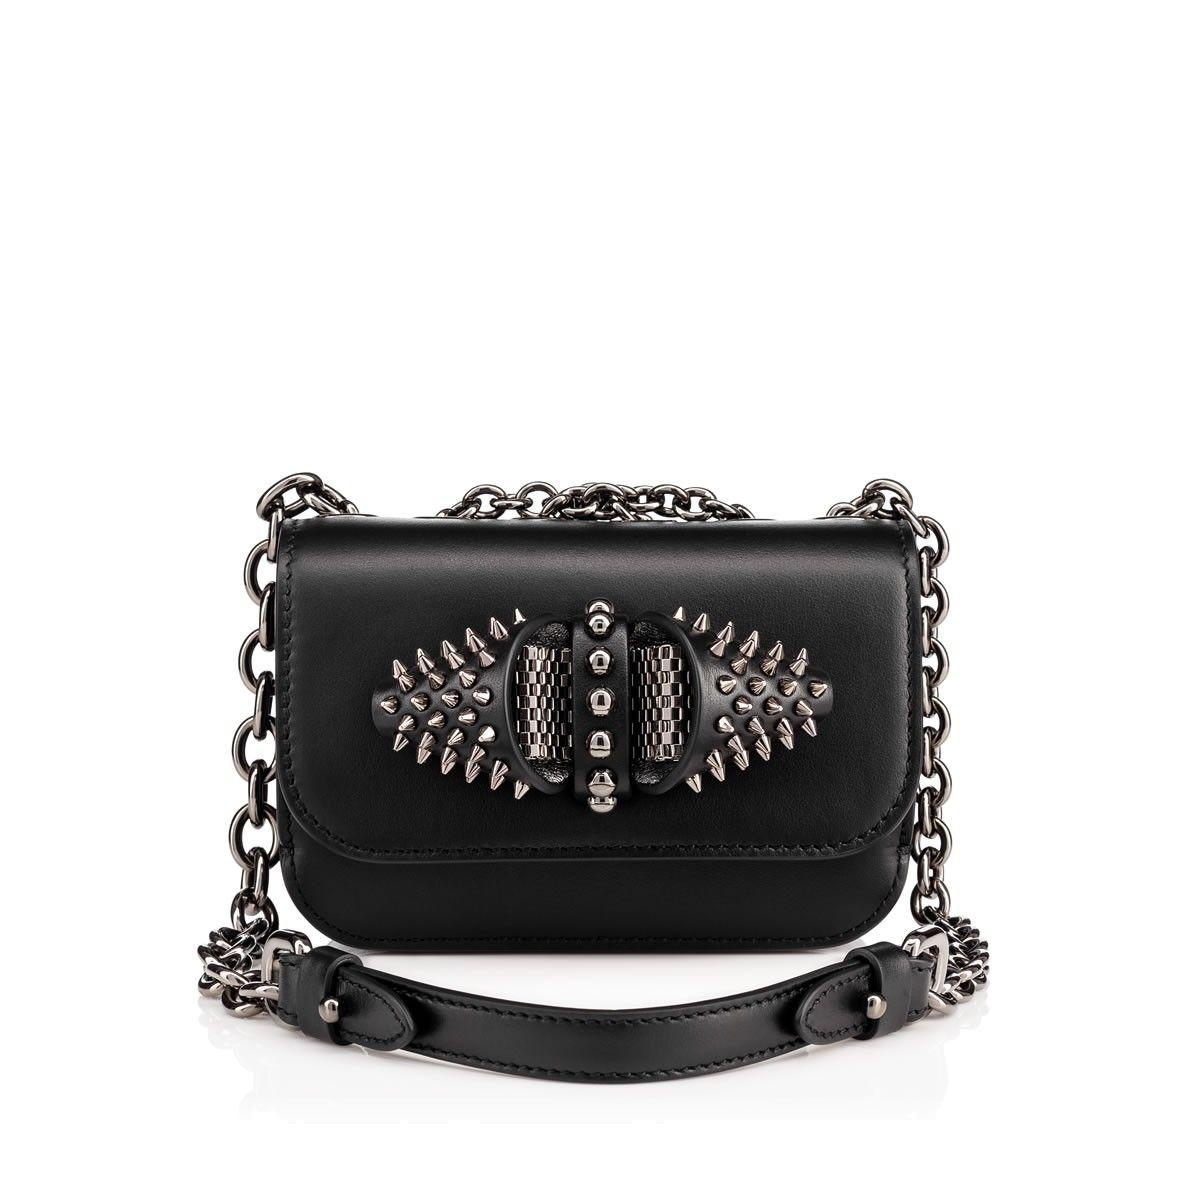 637328dfda0 CHRISTIAN LOUBOUTIN Sweety Charity mini chain bag Black Calfskin - Handbags  - Christian Louboutin. #christianlouboutin #bags # #